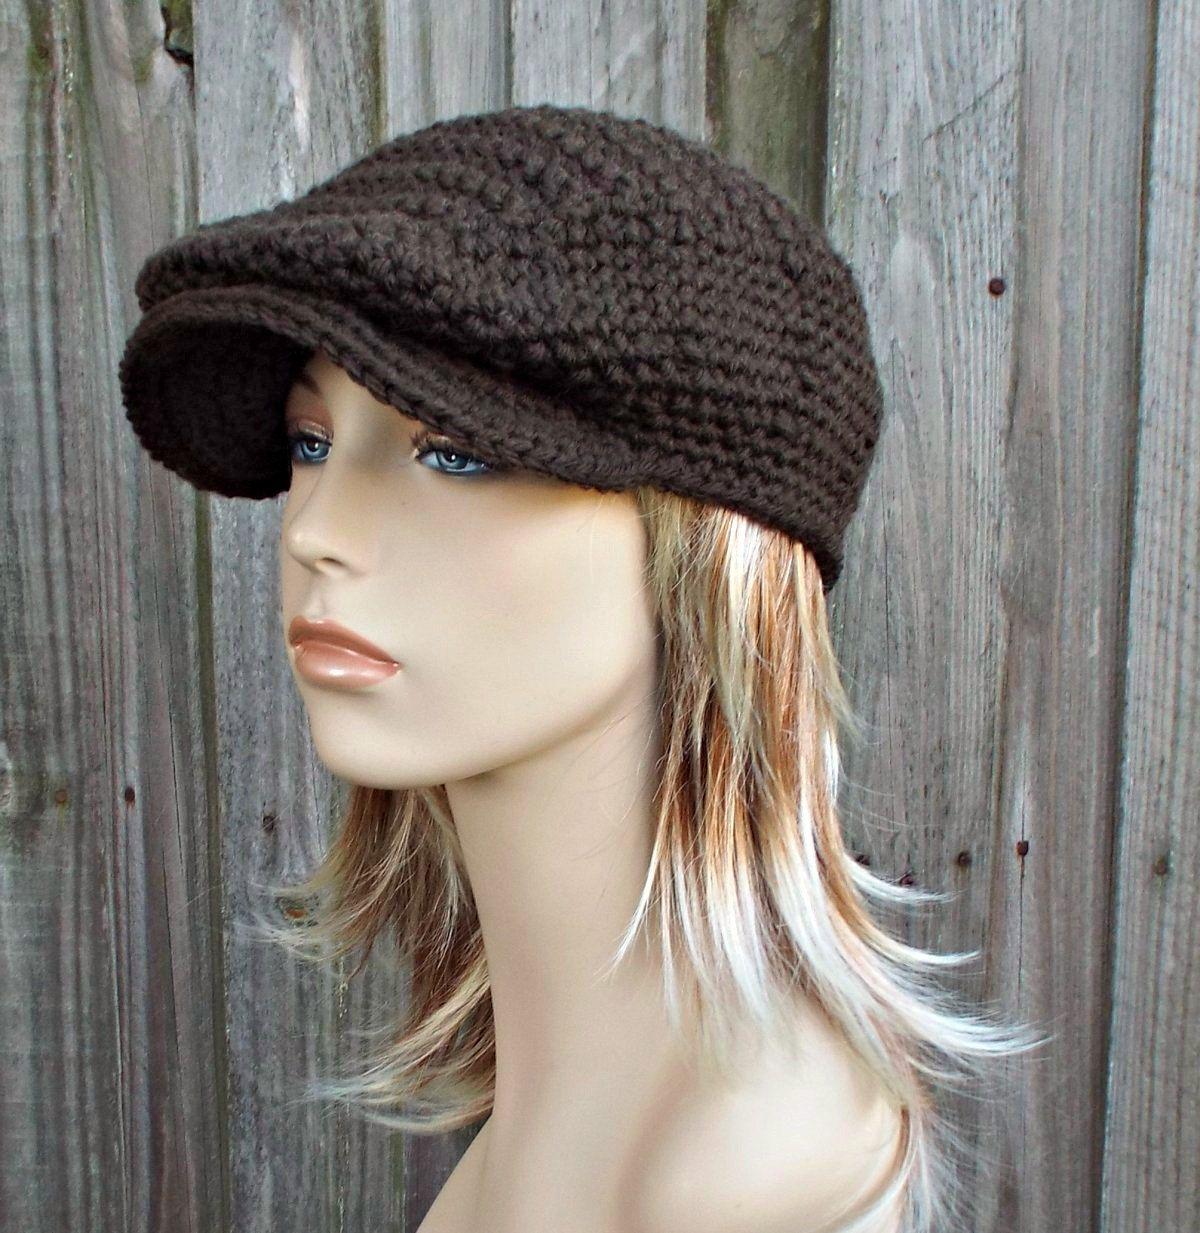 Dark Chocolate Brown Crochet Golf Hat - Womens or Mens Newsboy Flat Cap by  pixiebell on Etsy 5dea73a59962